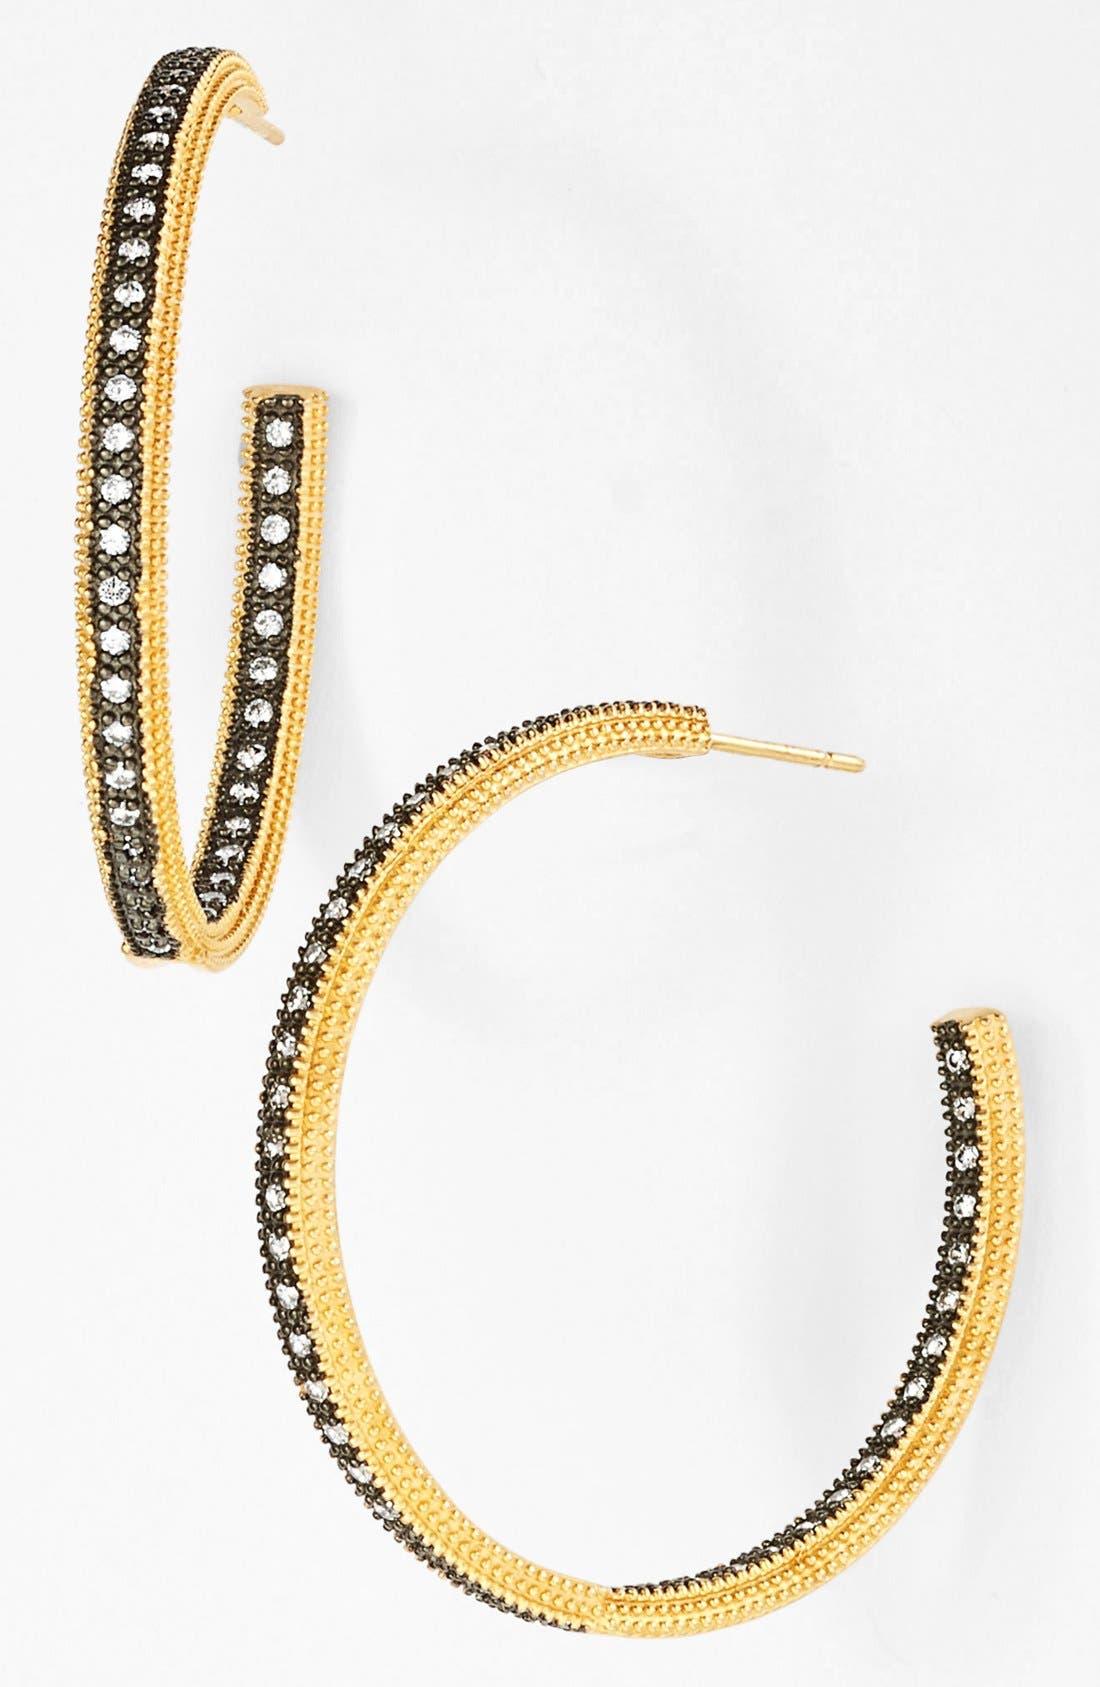 Alternate Image 1 Selected - FREIDA ROTHMAN 'The Standards' Inside Out Hoop Earrings